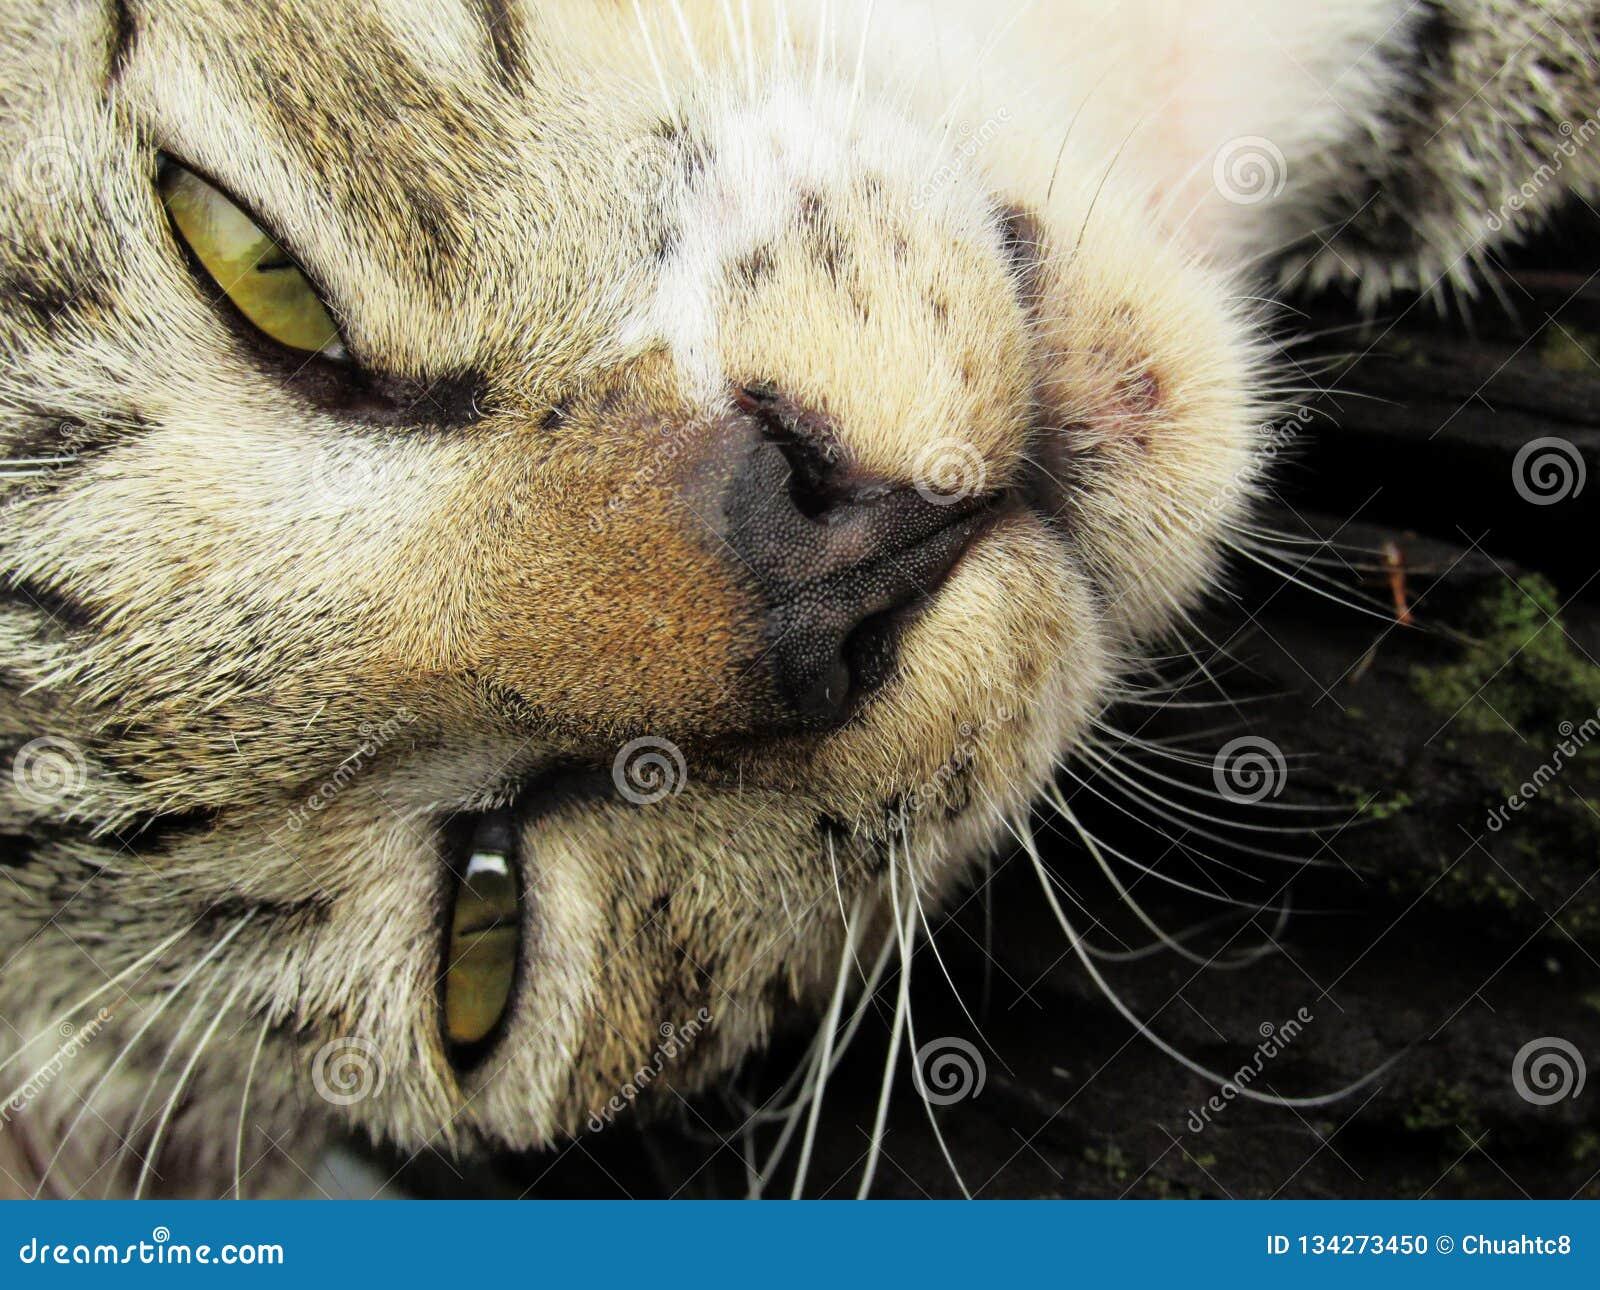 Sleepy Tabby Cat Up Close